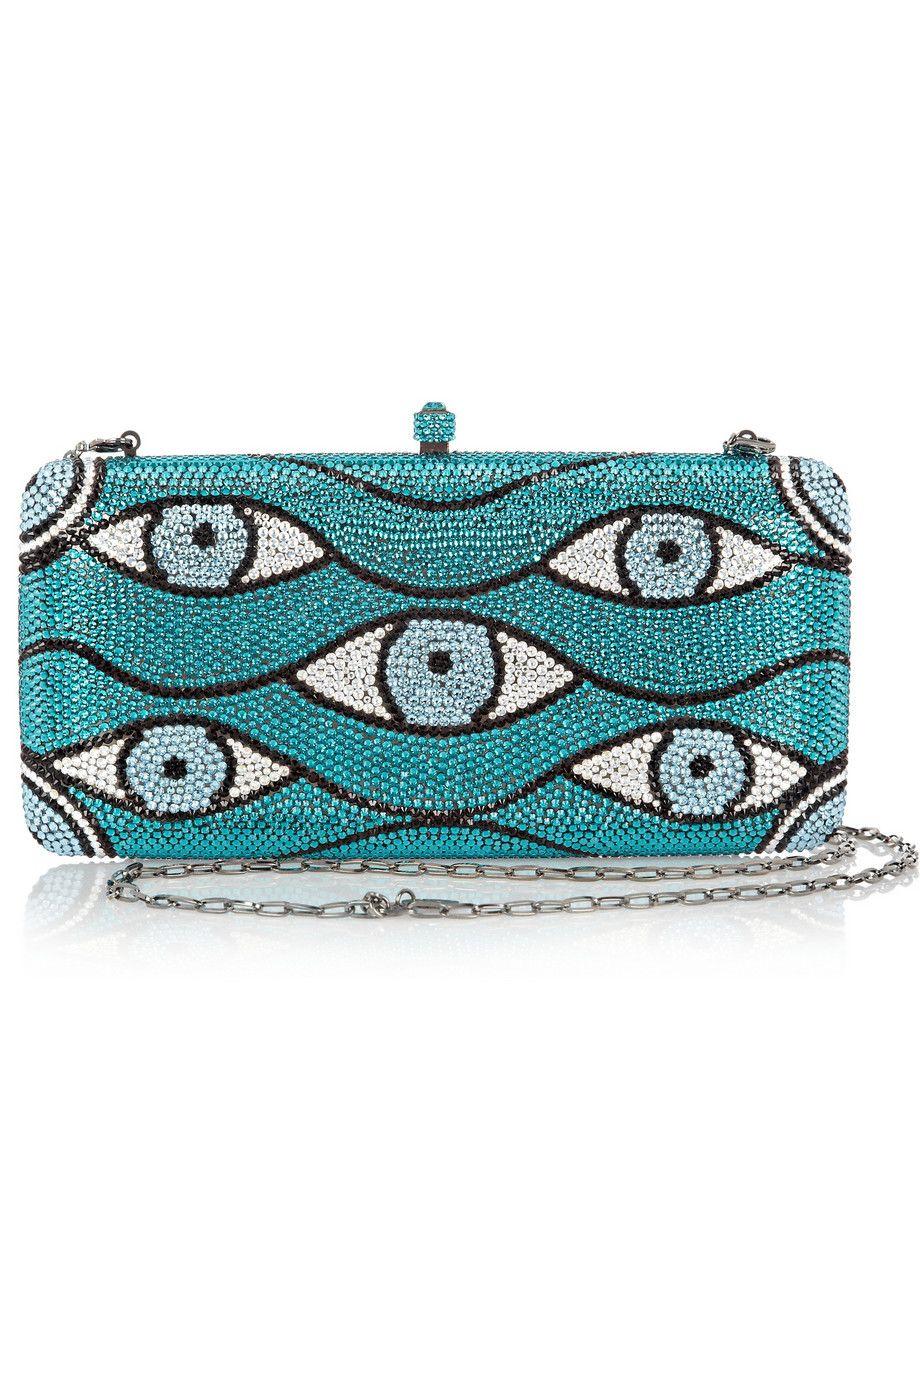 3bf72c02f39 Sylvia Toledano | Looks Swarovski crystal-embellished box clutch |  NET-A-PORTER.COM